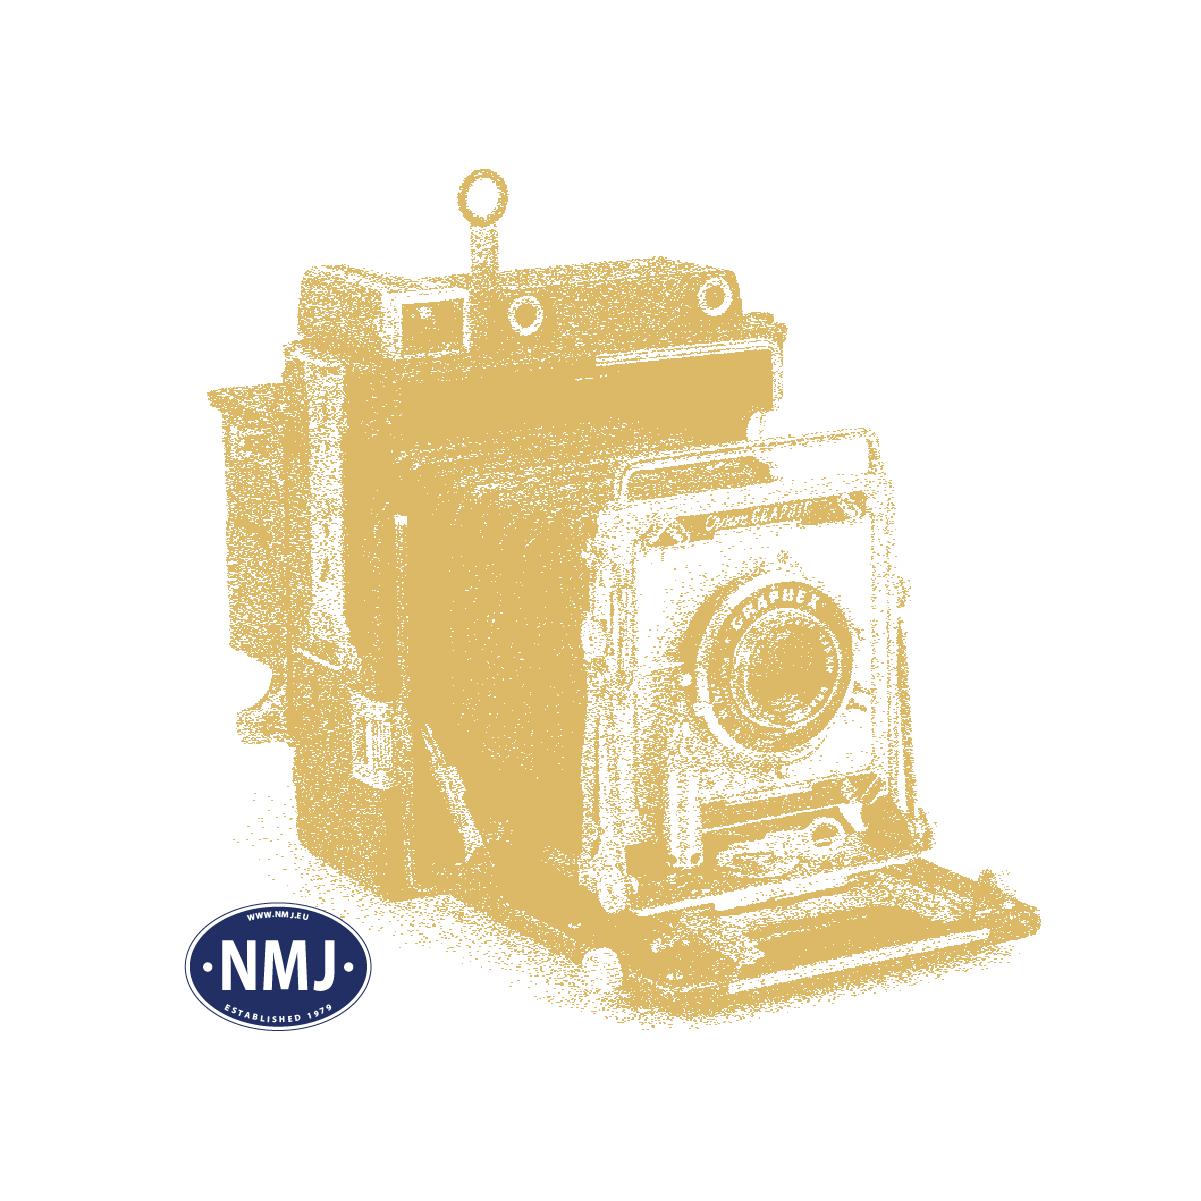 NMJT505.402 - NMJ Topline Rps 3176-3933498-4 Flachwagen NSB mit Holzschnitzelcontainer